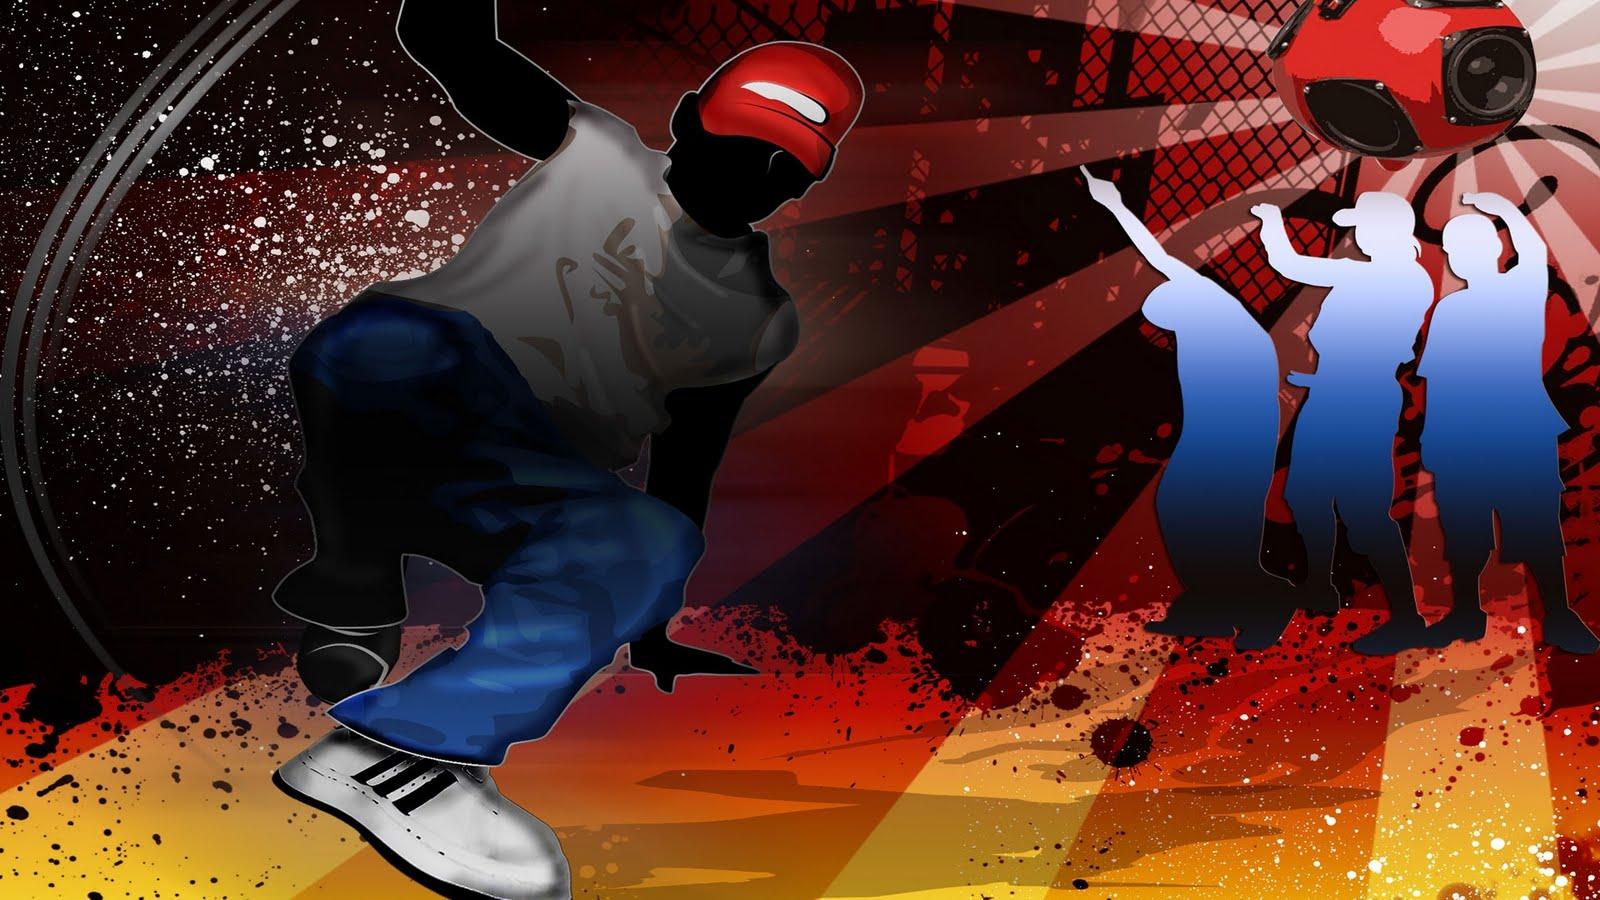 Hip Hop Break Dance Streetdance on Box Step Dance Steps